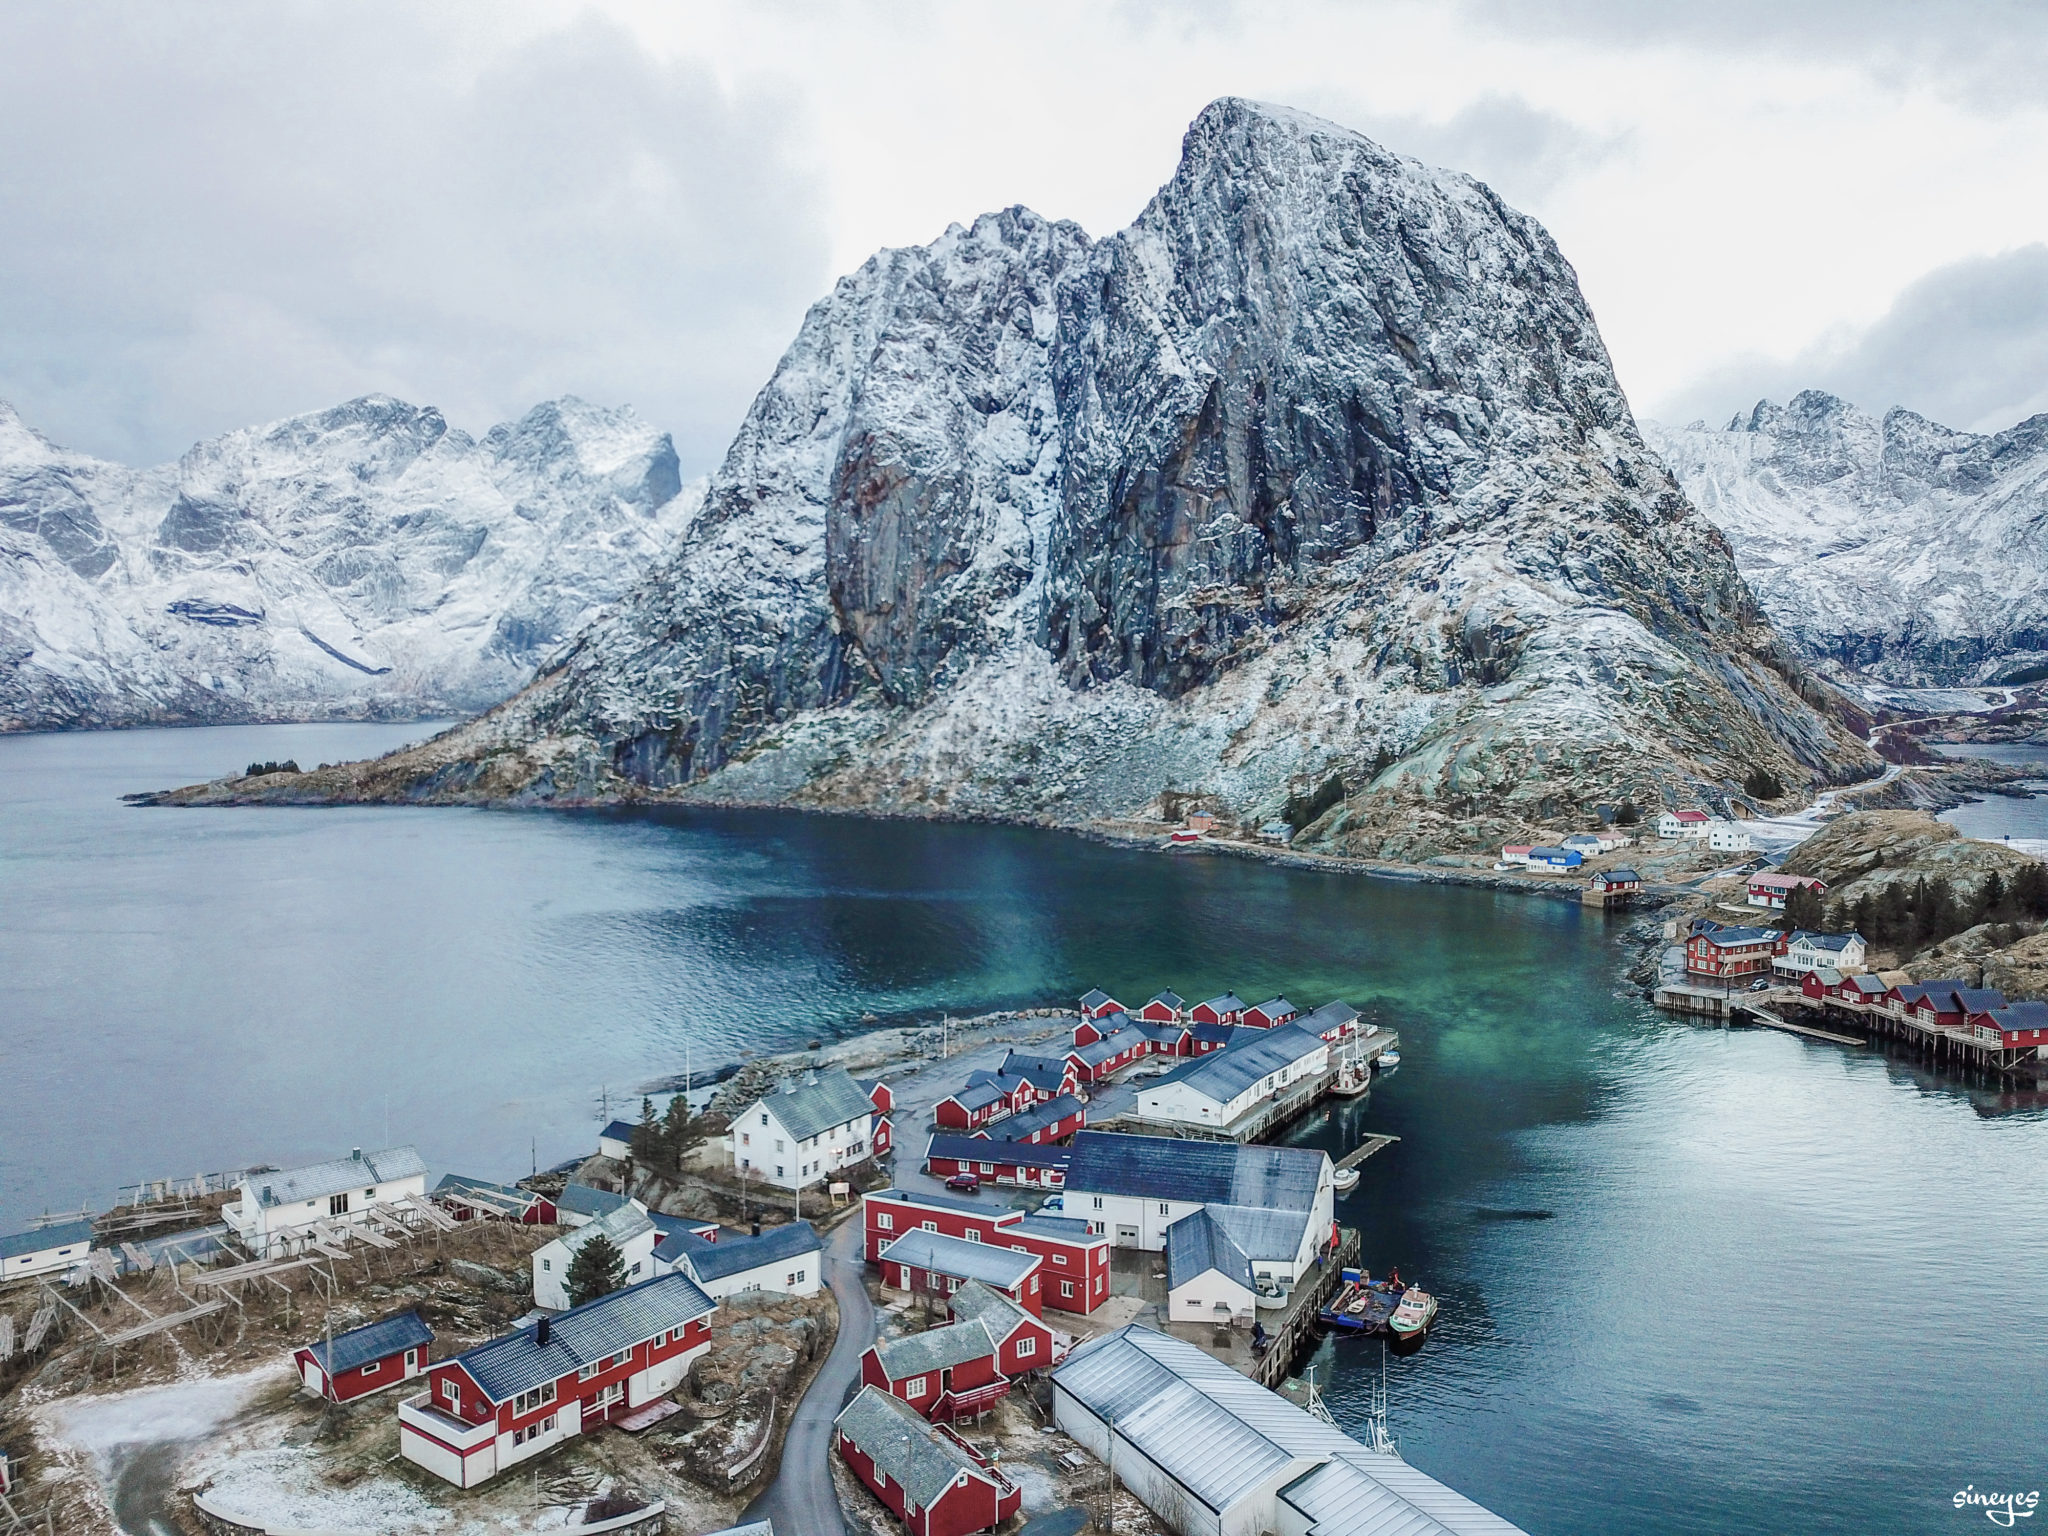 Hamnoy view - iles lofoten, Norvège by sineyes